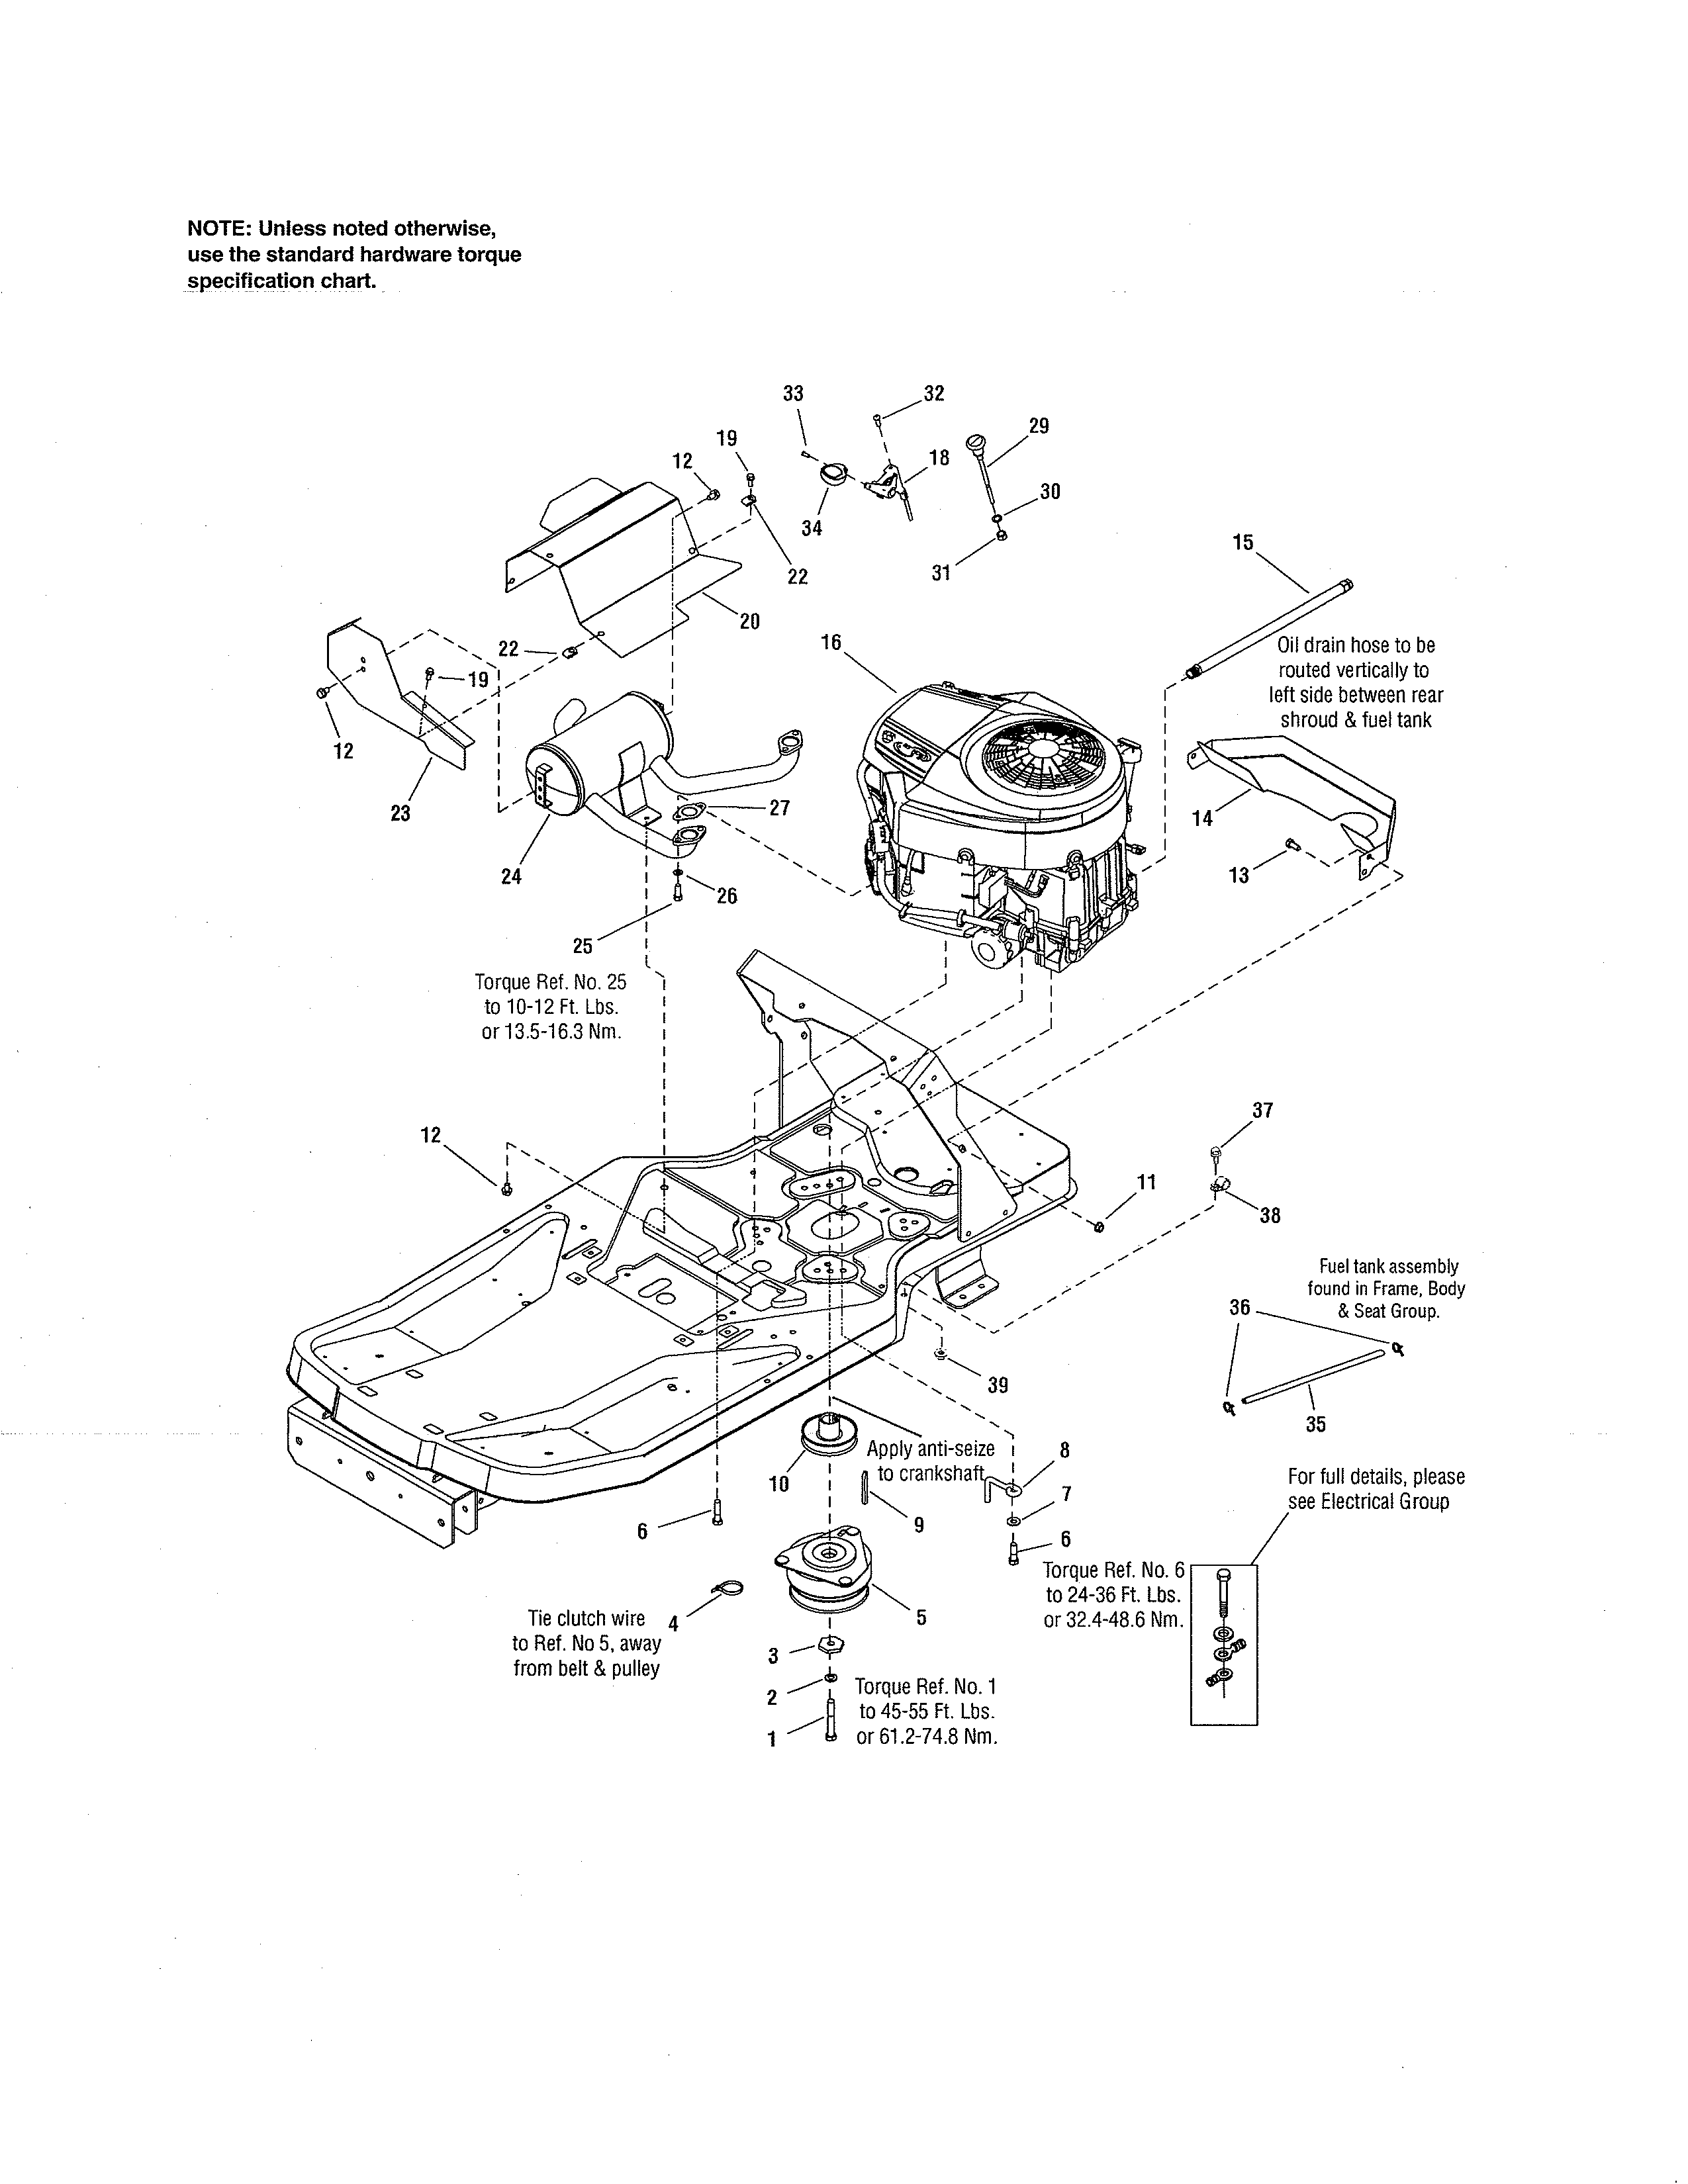 1 2 Hp Kohler Engine Parts Diagram Wiring Kia Sportage Fog Light Wiring Begeboy Wiring Diagram Source